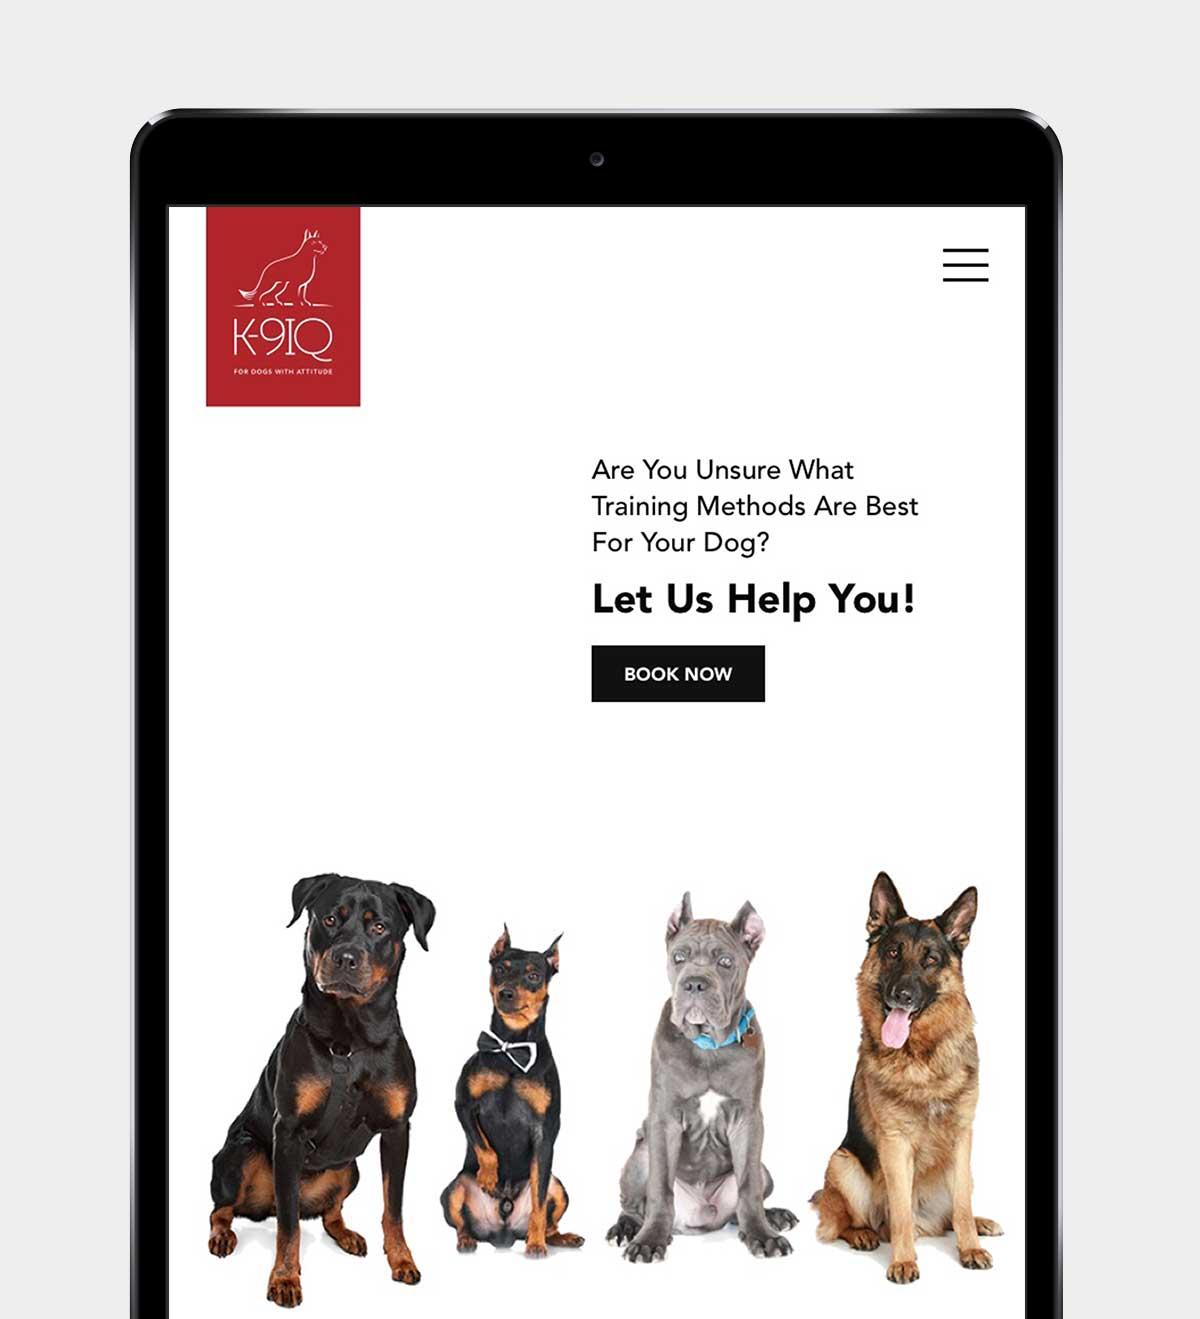 K9IQ responsive website on iPad in portrait view